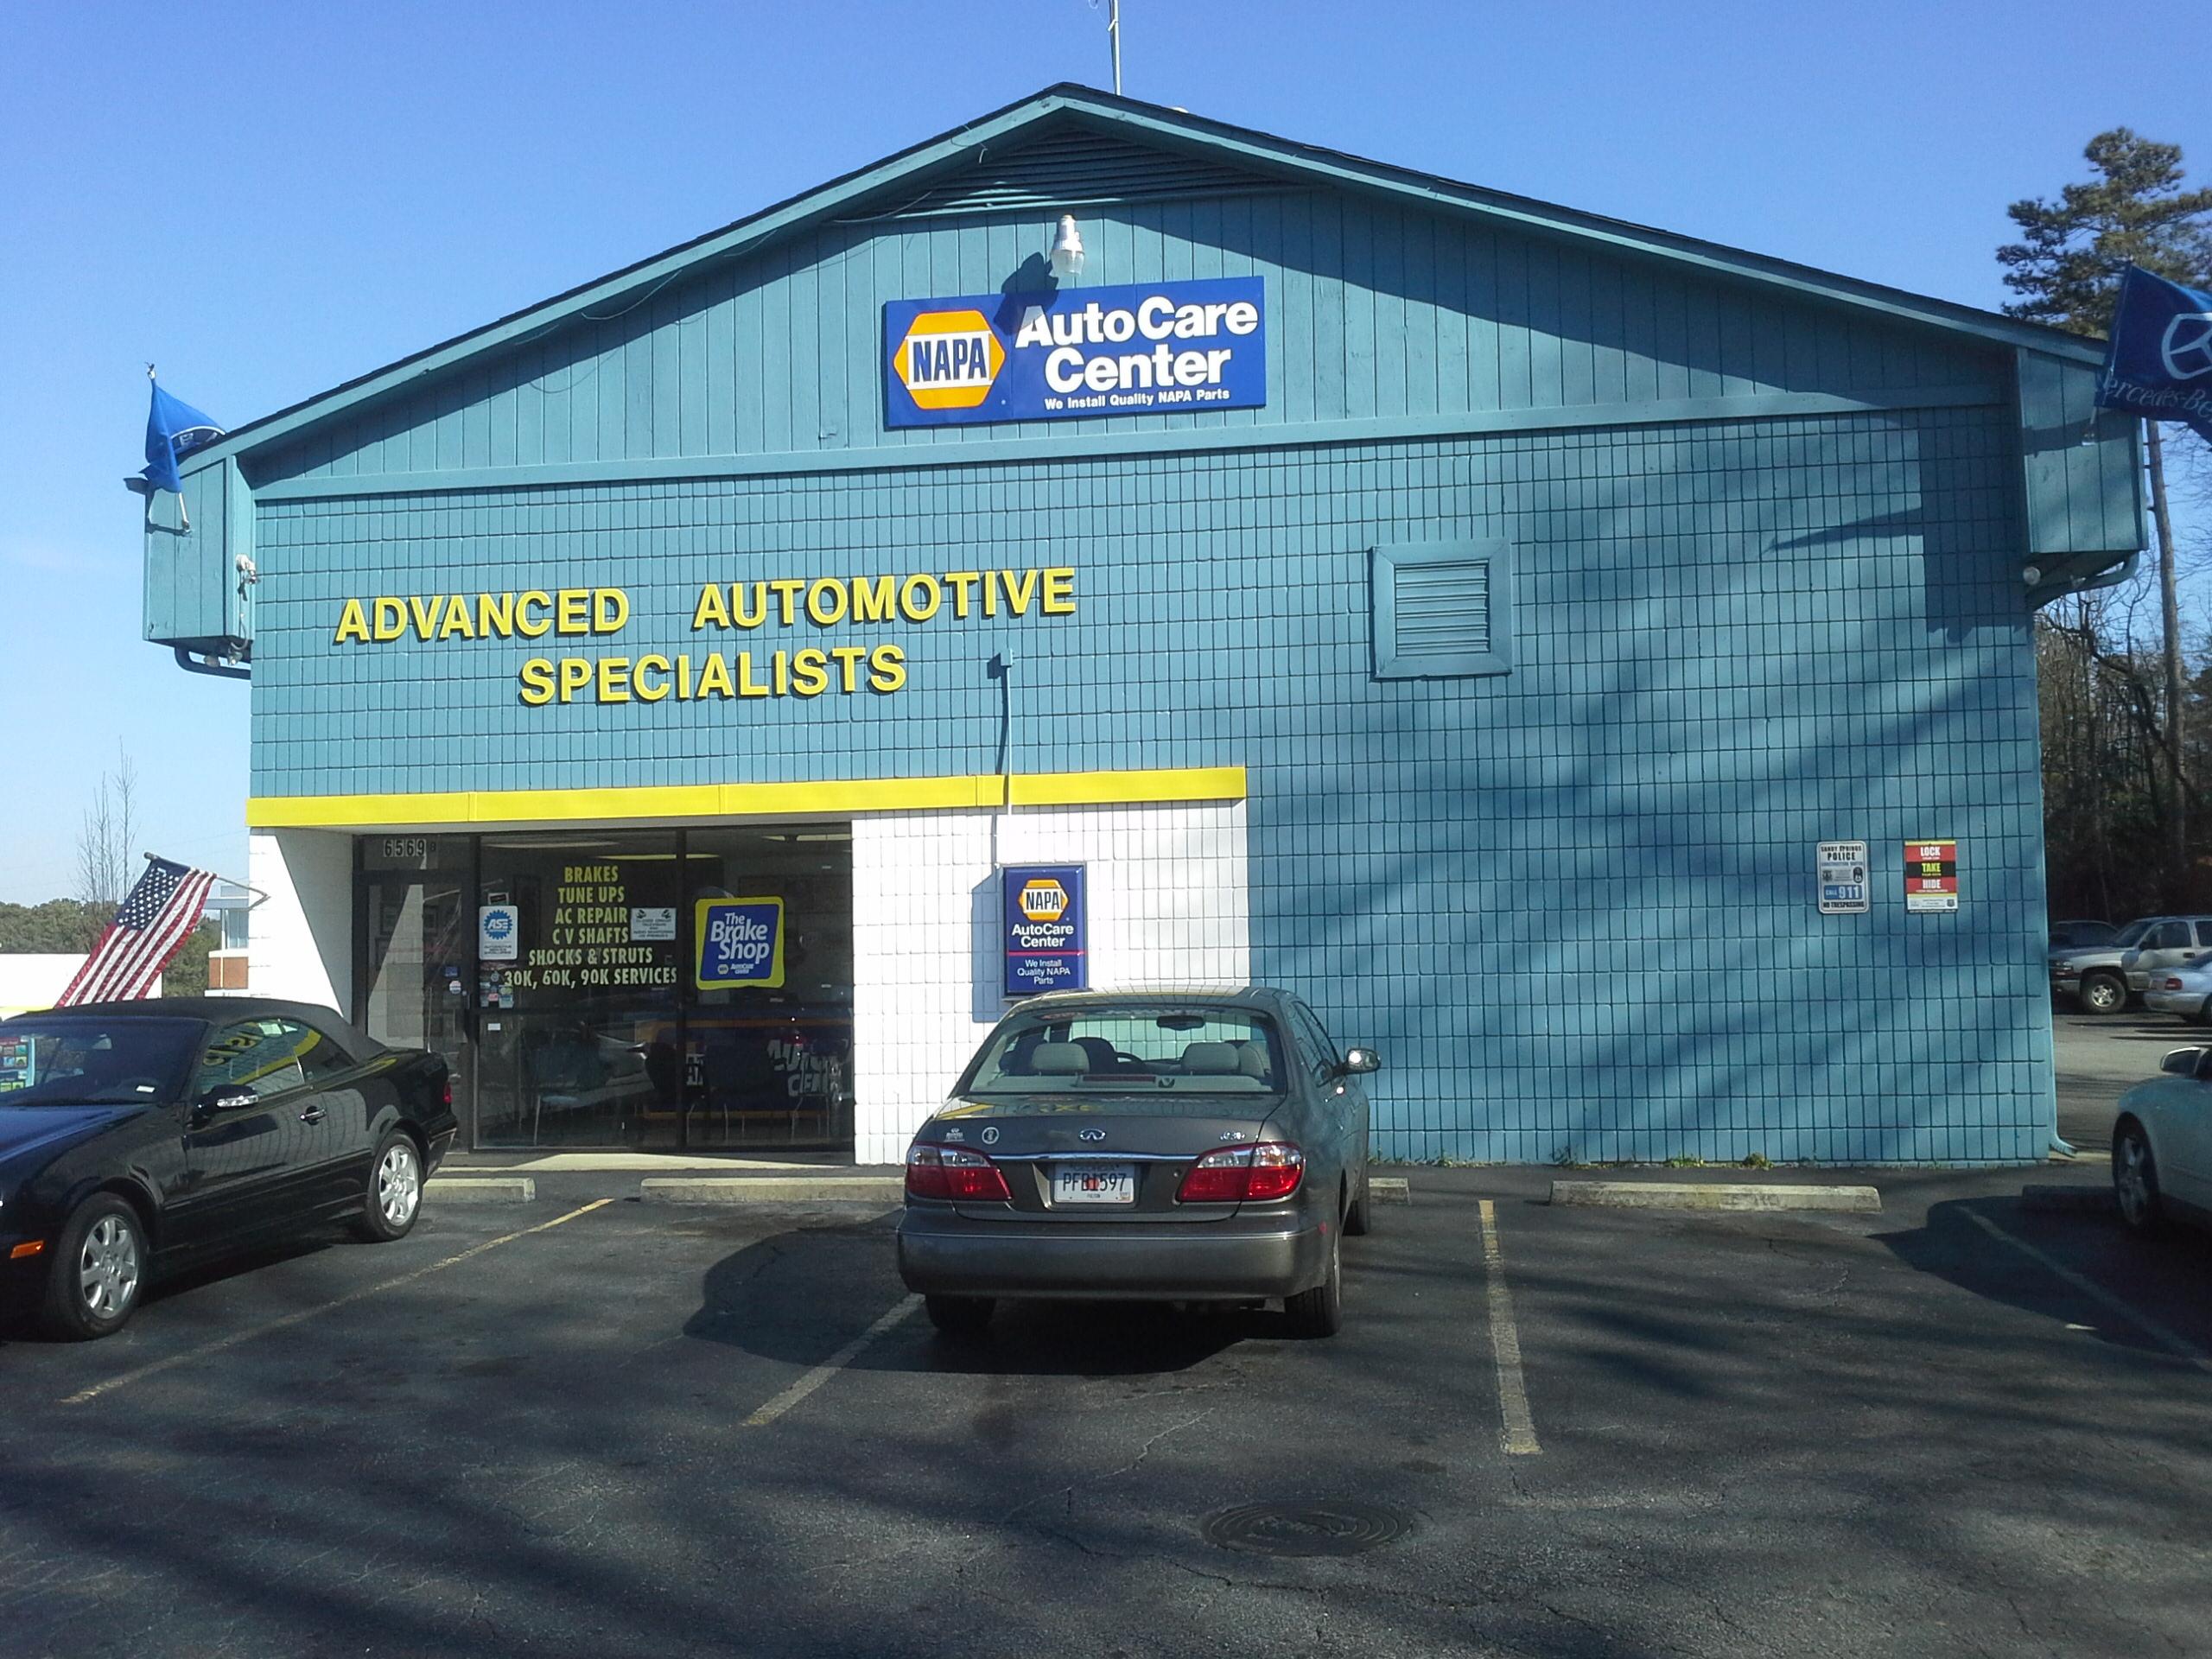 Advanced automotive specialists atlanta georgia ga for Toyota motor credit corporation atlanta